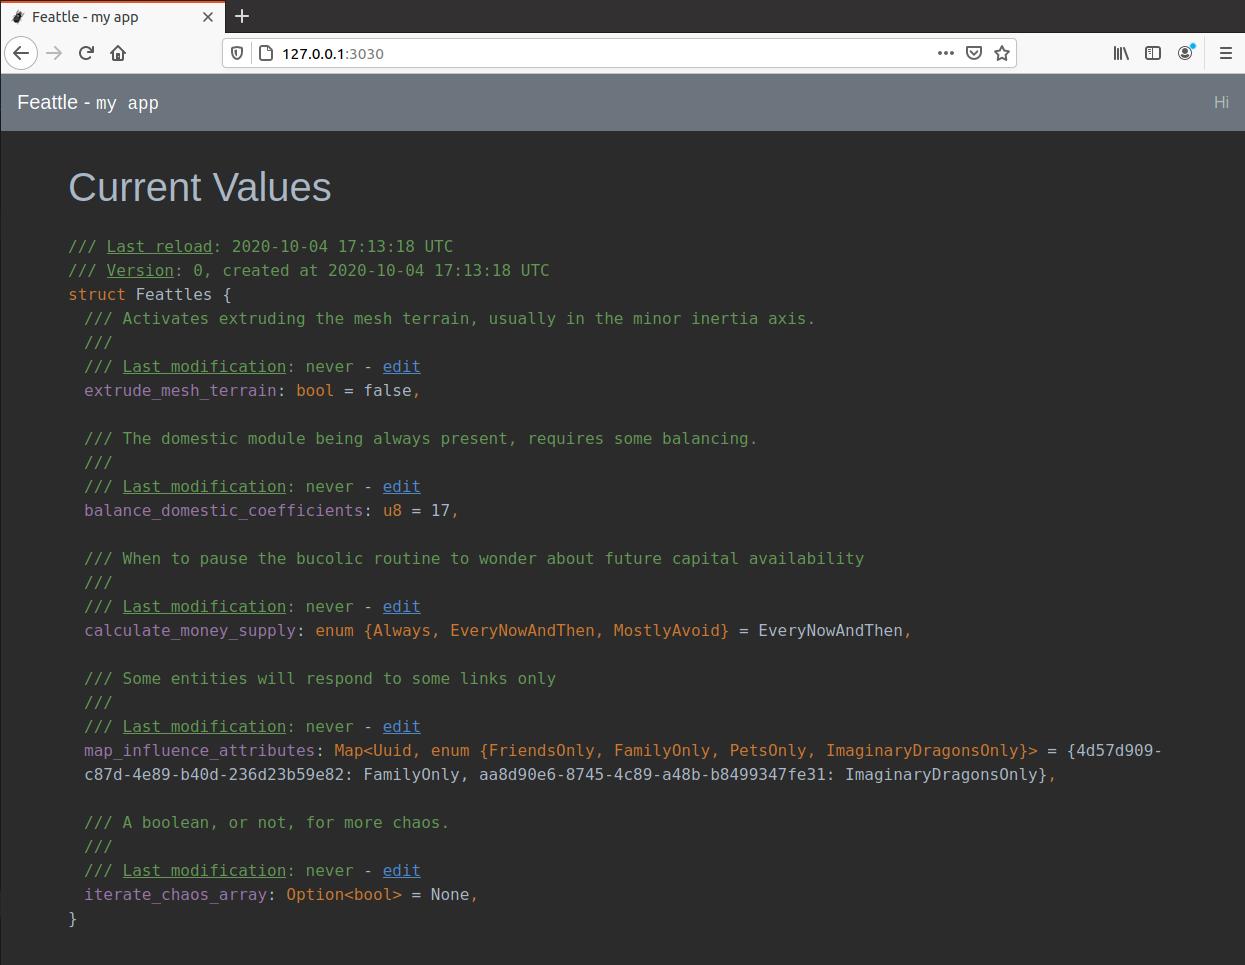 Web Admin UI